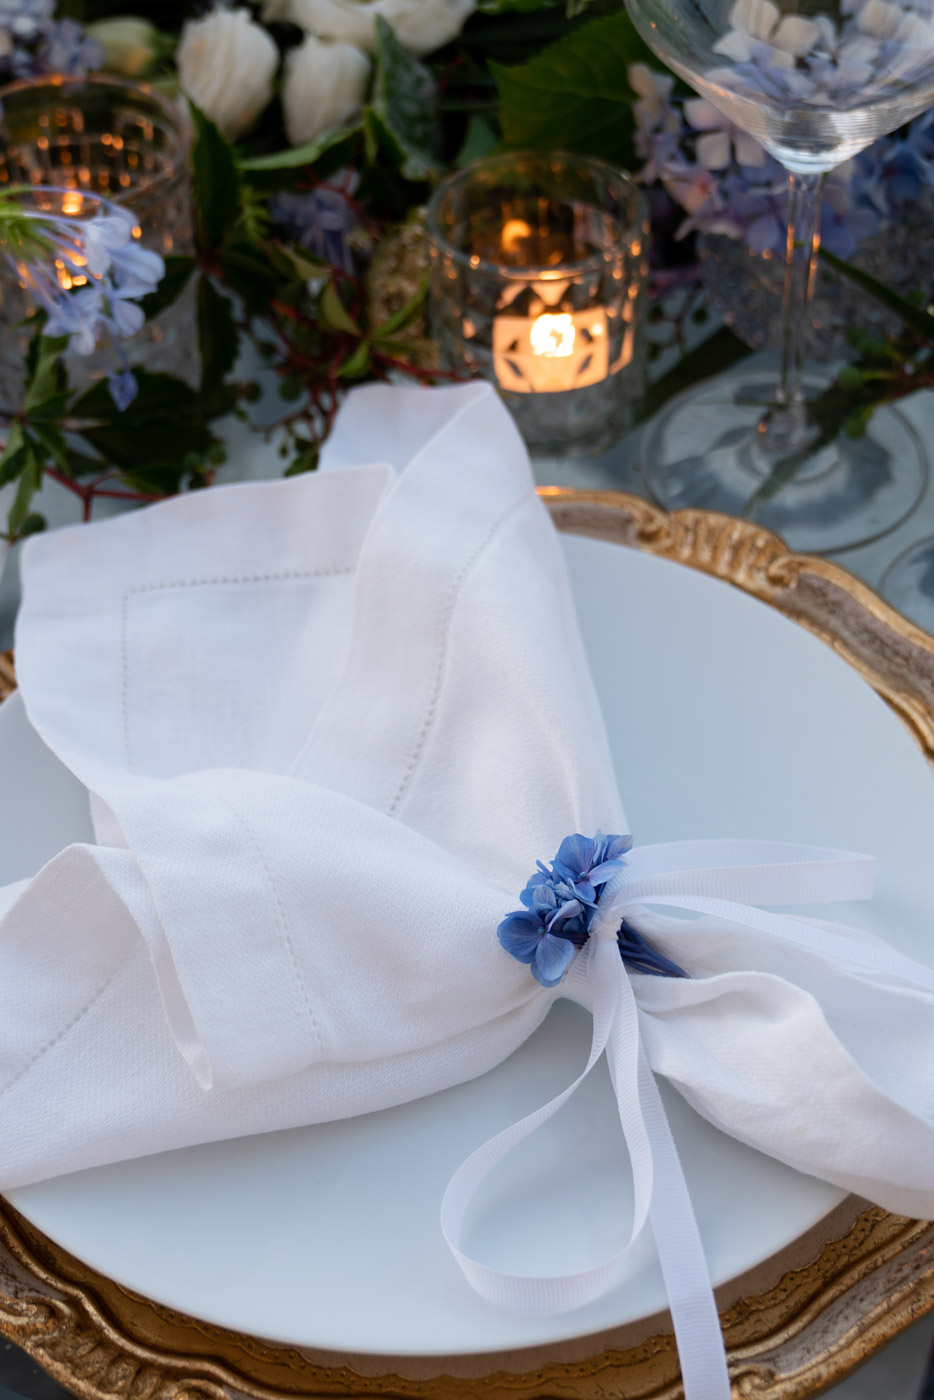 Wedding table setting floral napkin detail designed by Eddie Zaratsian at Villa Astor, Sorrento, Italy - photo by Adagion Studio